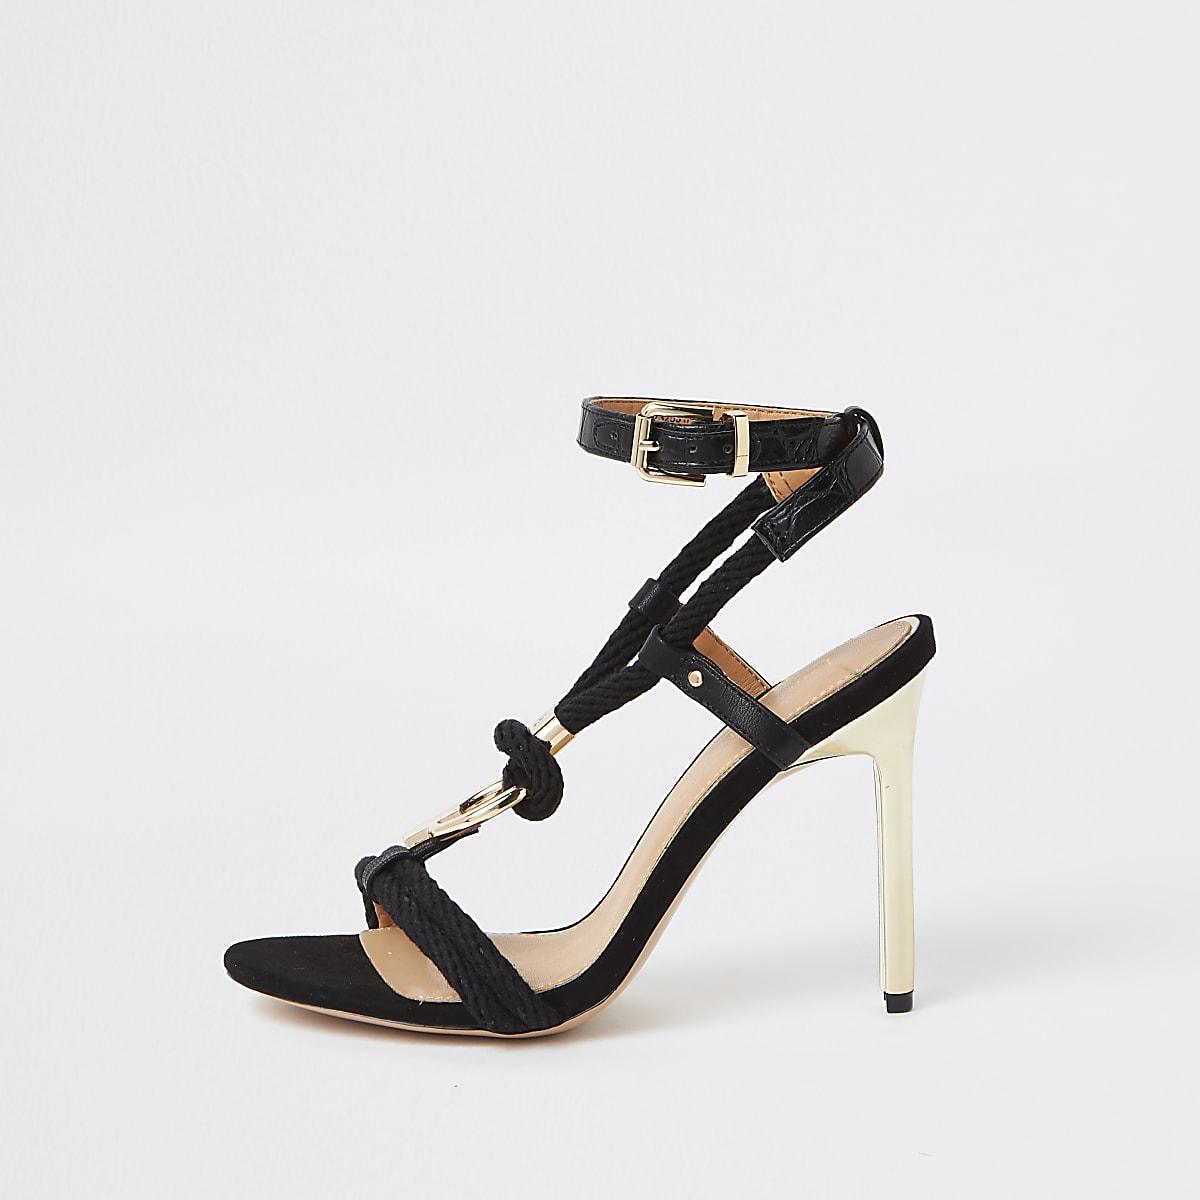 Black rope ring stiletto heel sandals